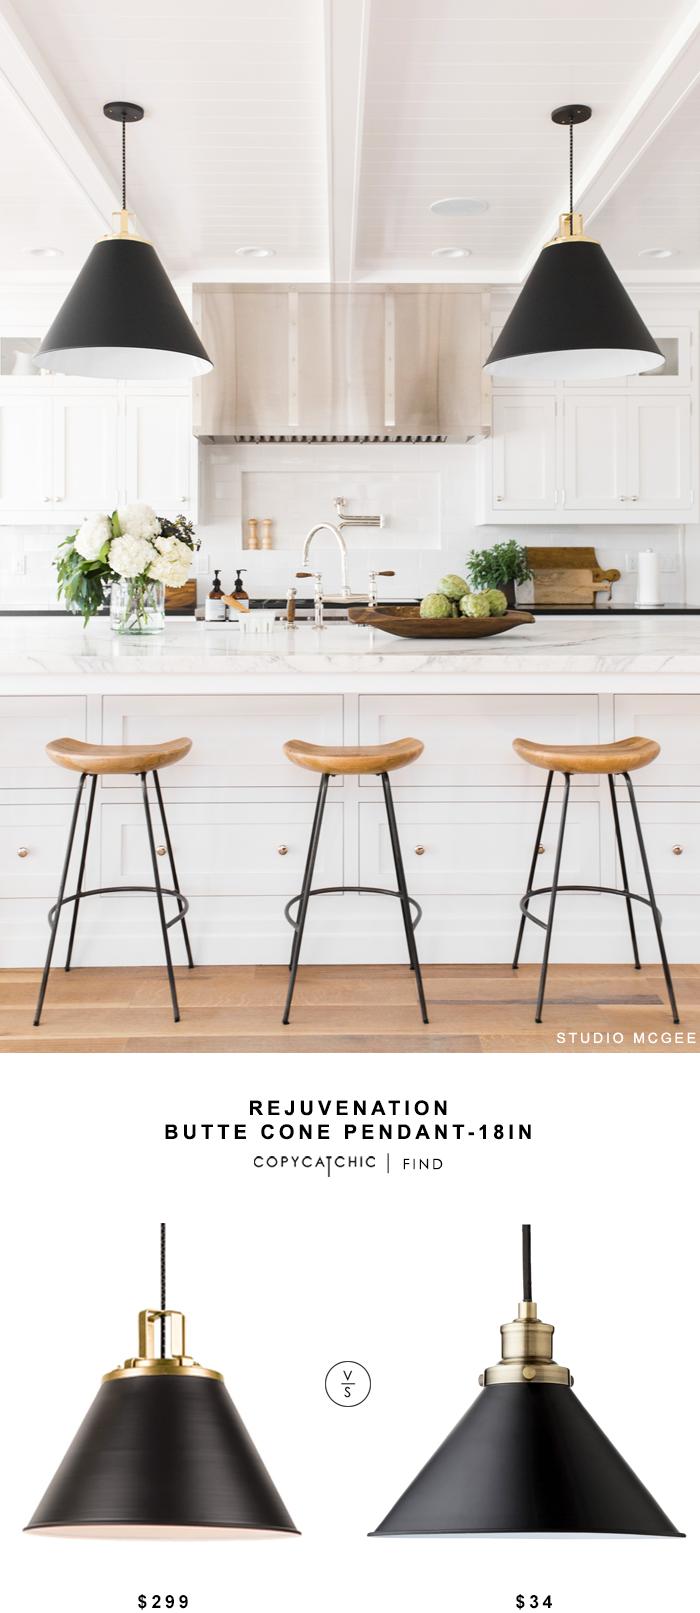 Rejuvenation Butte Cone Pendant For $299 Vs Target Crosby Small Pendant For  $36 @copycatchic Look. Black Counter StoolsBlack ...